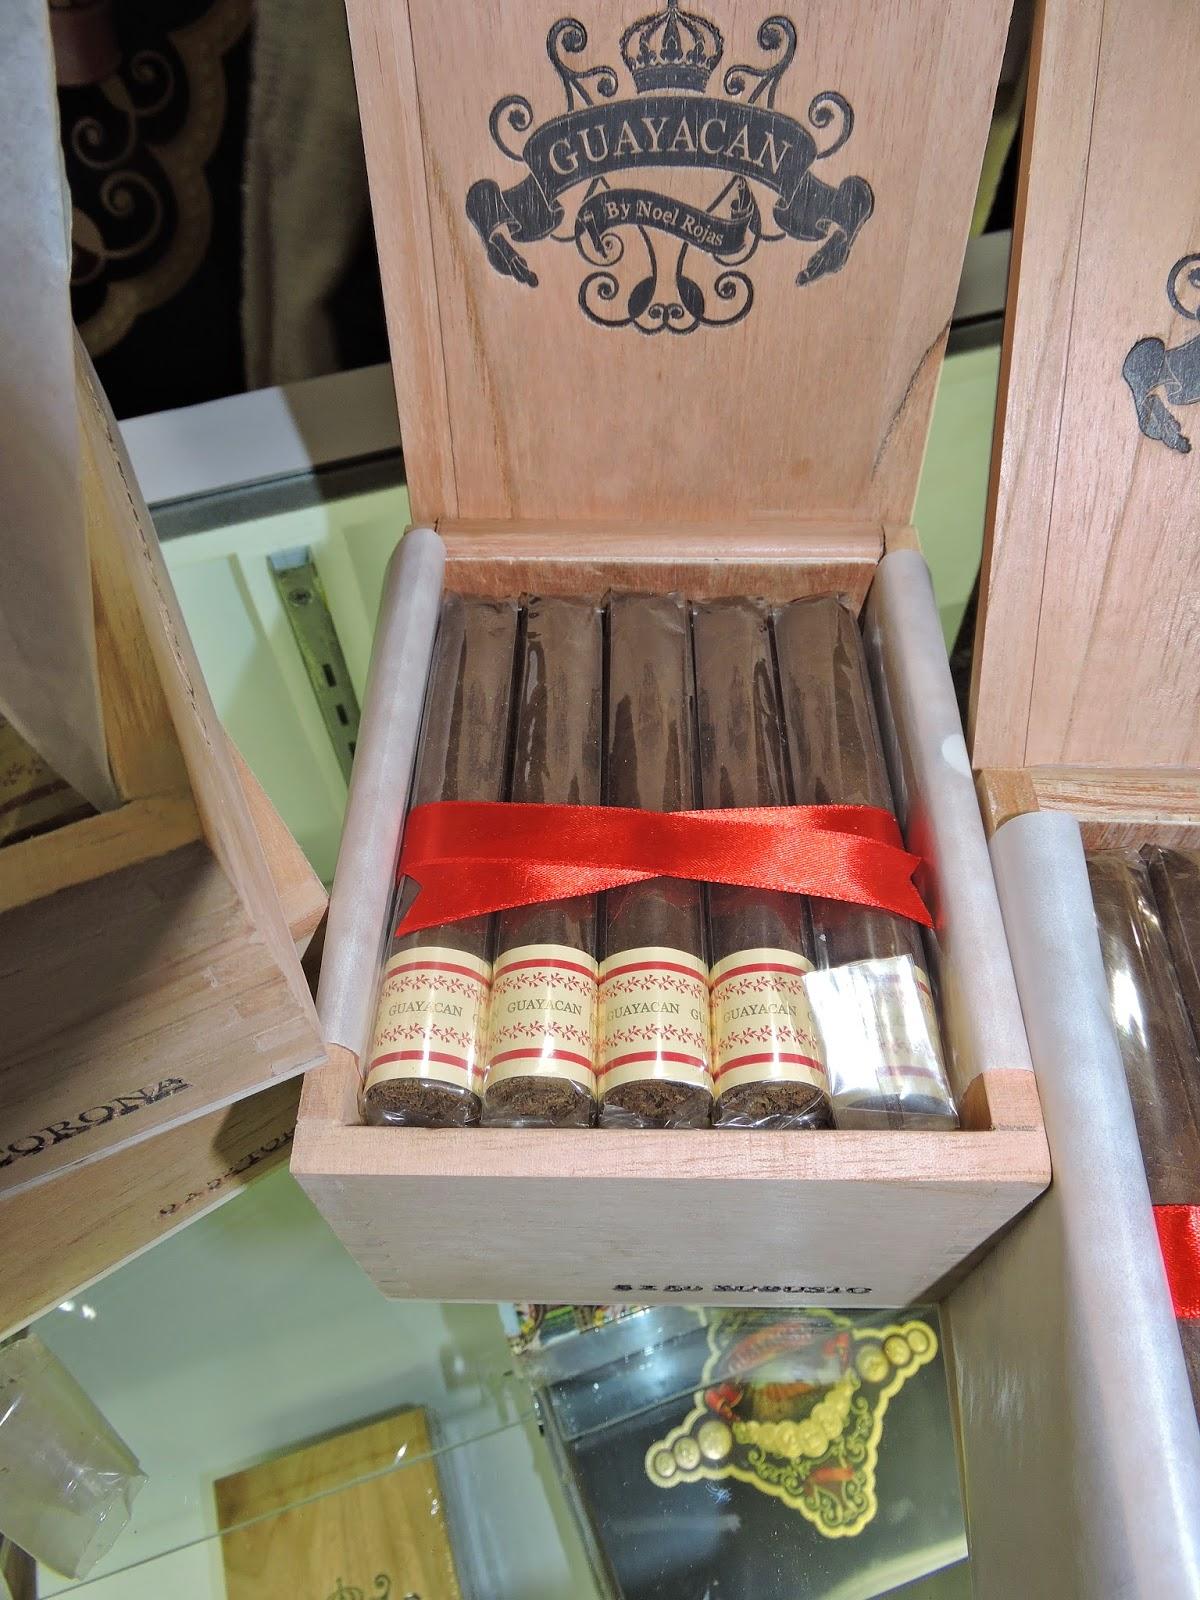 Cigar News: Guayacan Maduro (Cigar Preview)